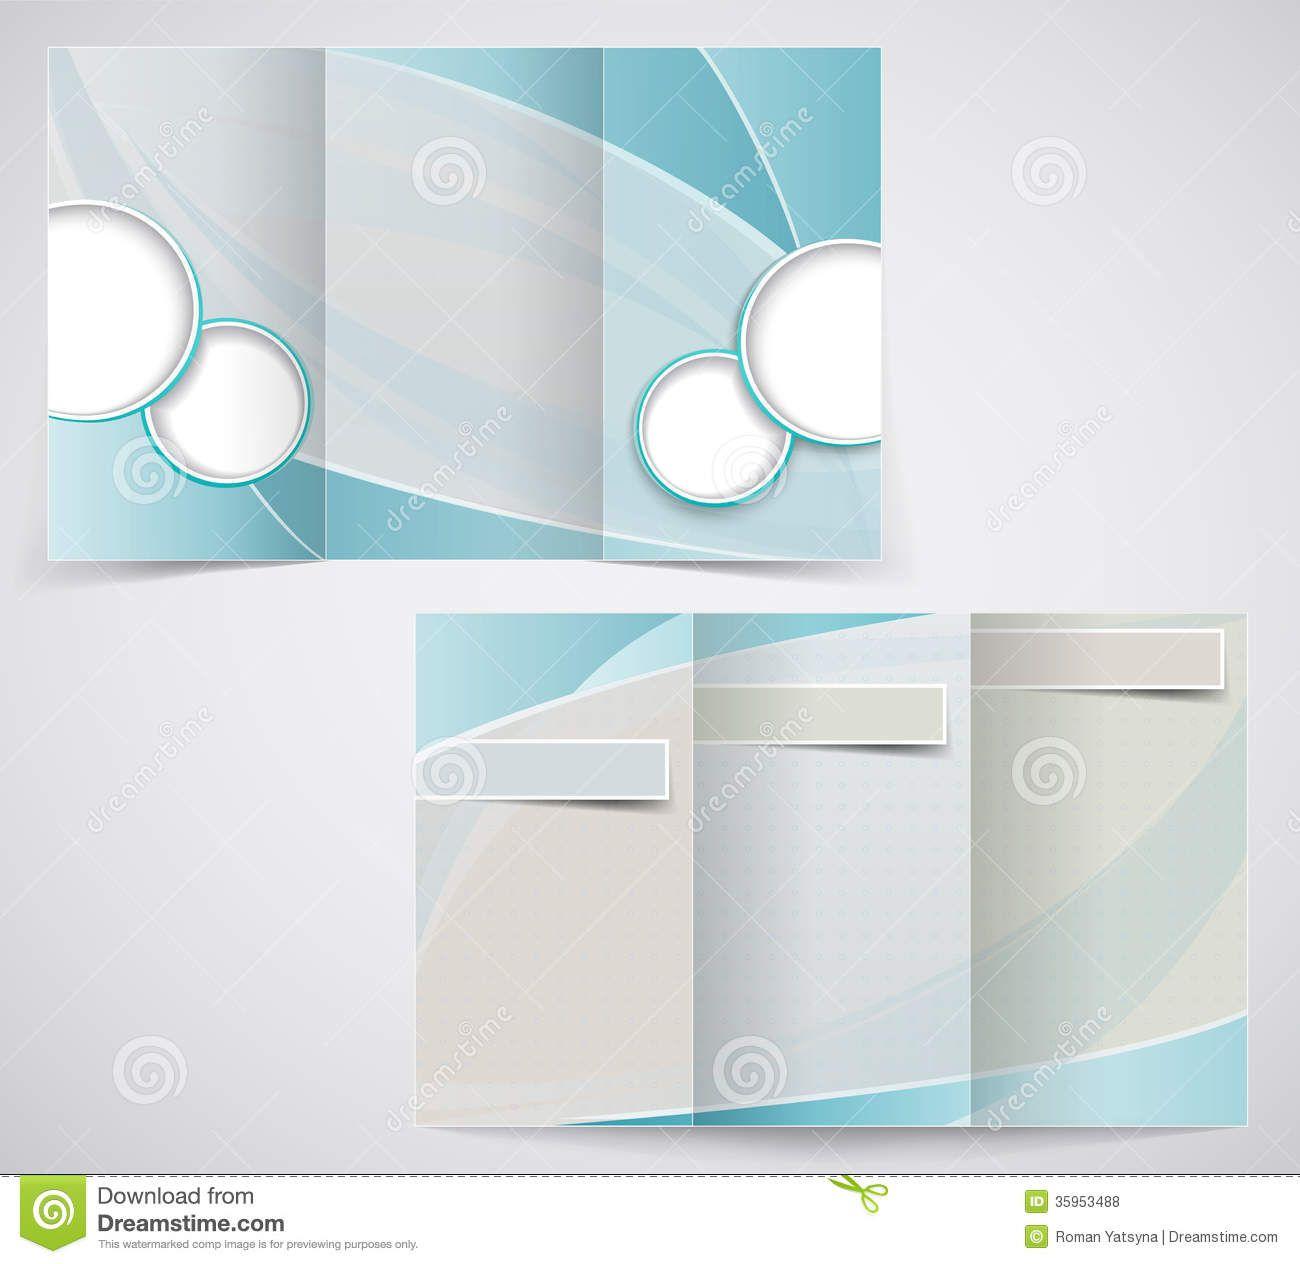 009 Fantastic Tri Fold Brochure Template Word High Resolution  2010 2007 FreeFull